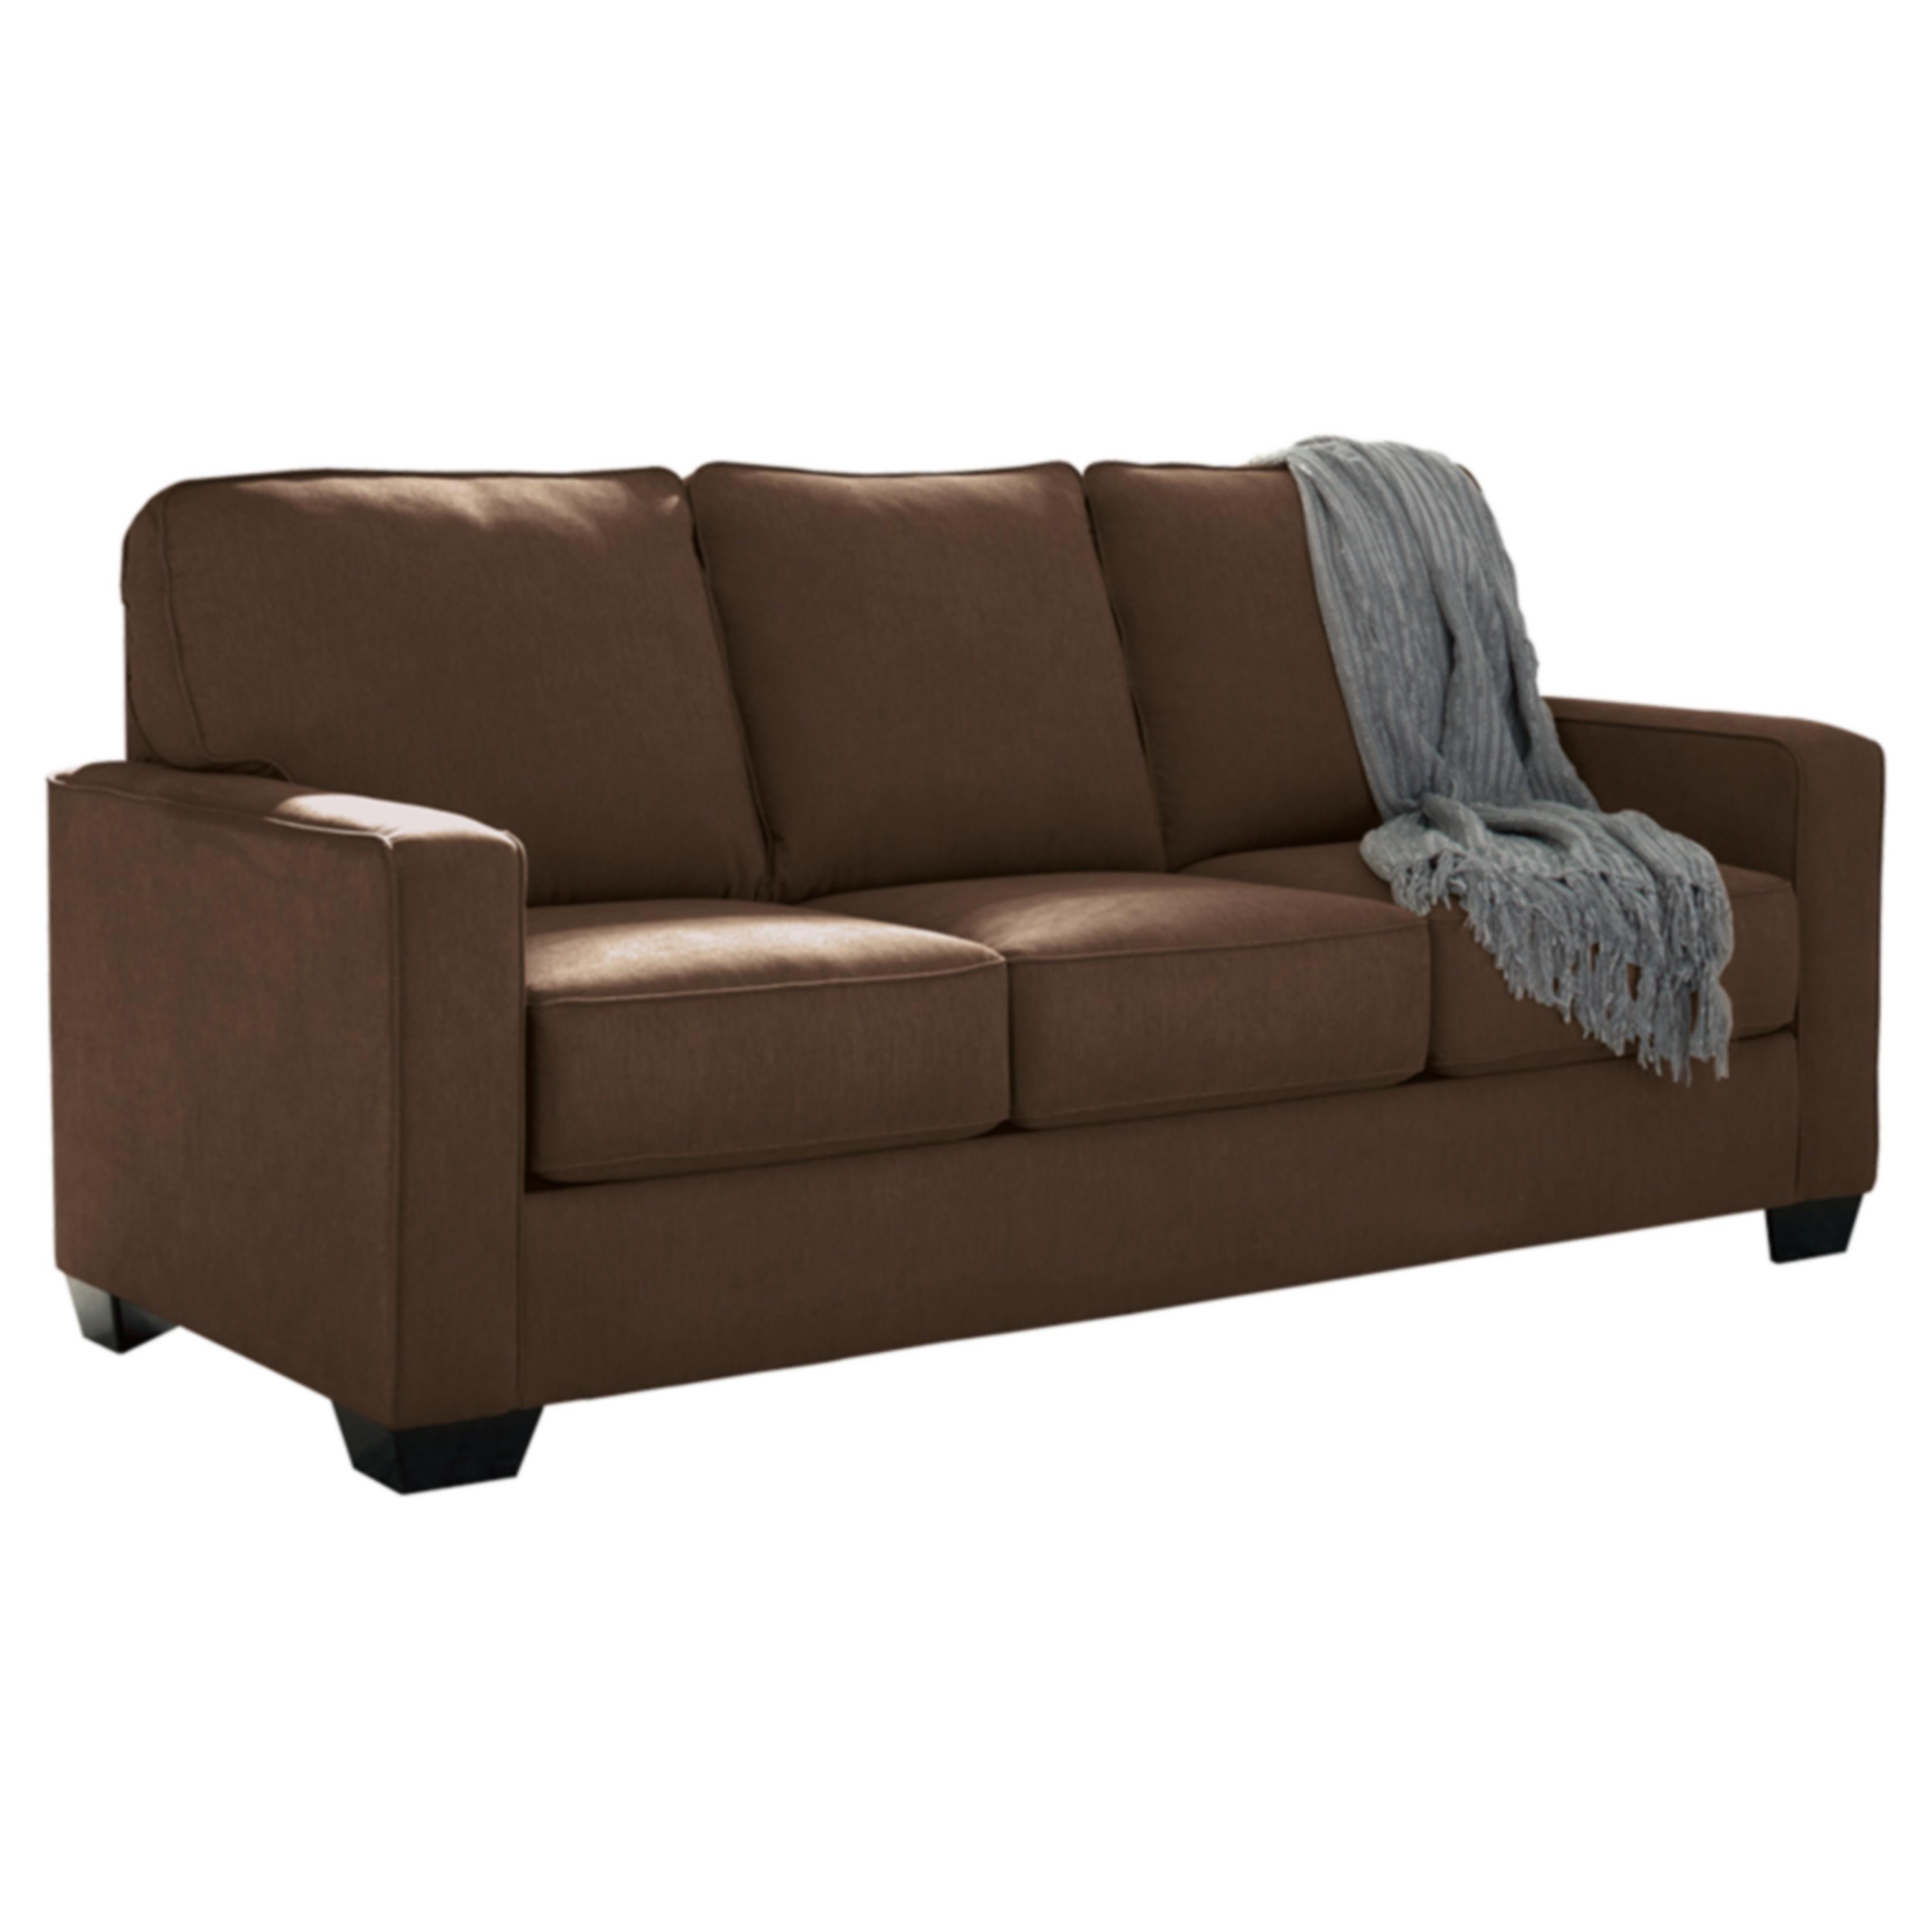 Ashley Zeb Espresso Full Sofa Sleeper (Twin Sofa Sleeper)...